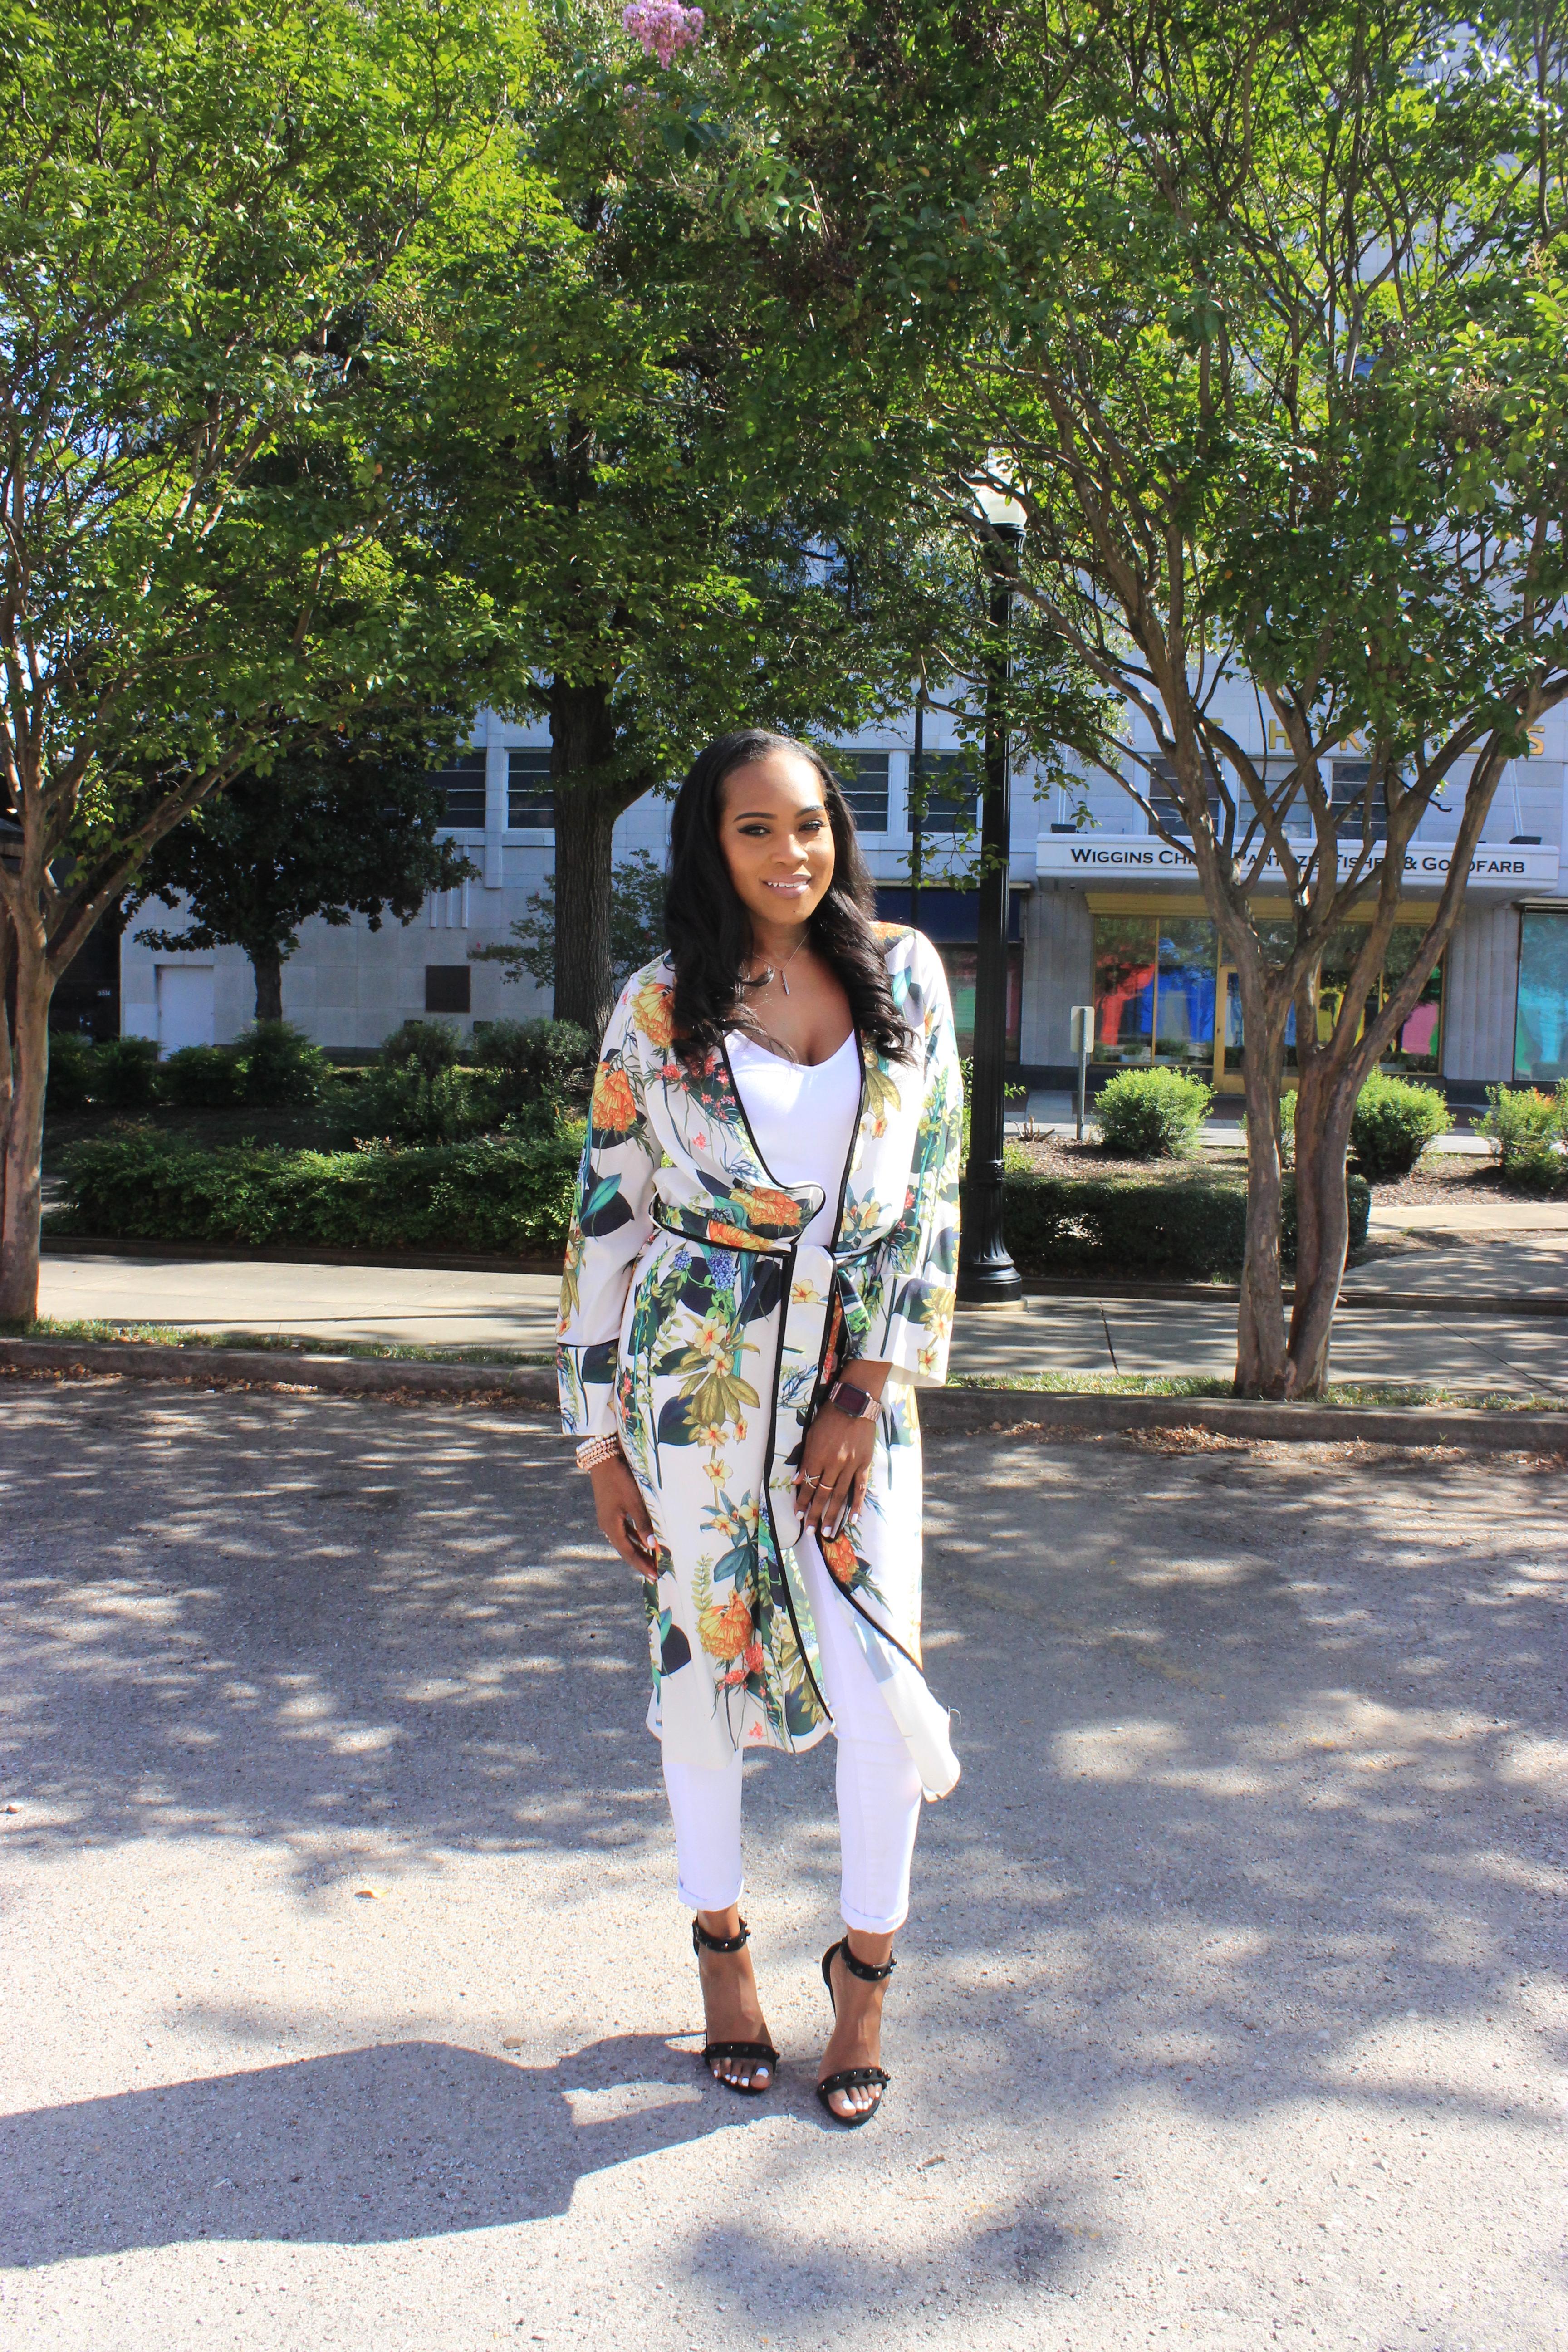 Style-files-White-Civil-Skinny-Jeans-forever-21-white-bodysuit-shein-white-floral-Open Front Longline Kimono -Cape-Ribbon-black-Meg Ankle Strap Beaded Heel-Cape-Ribbon-studded-ankle-strap-sandals-oohlalablog-2